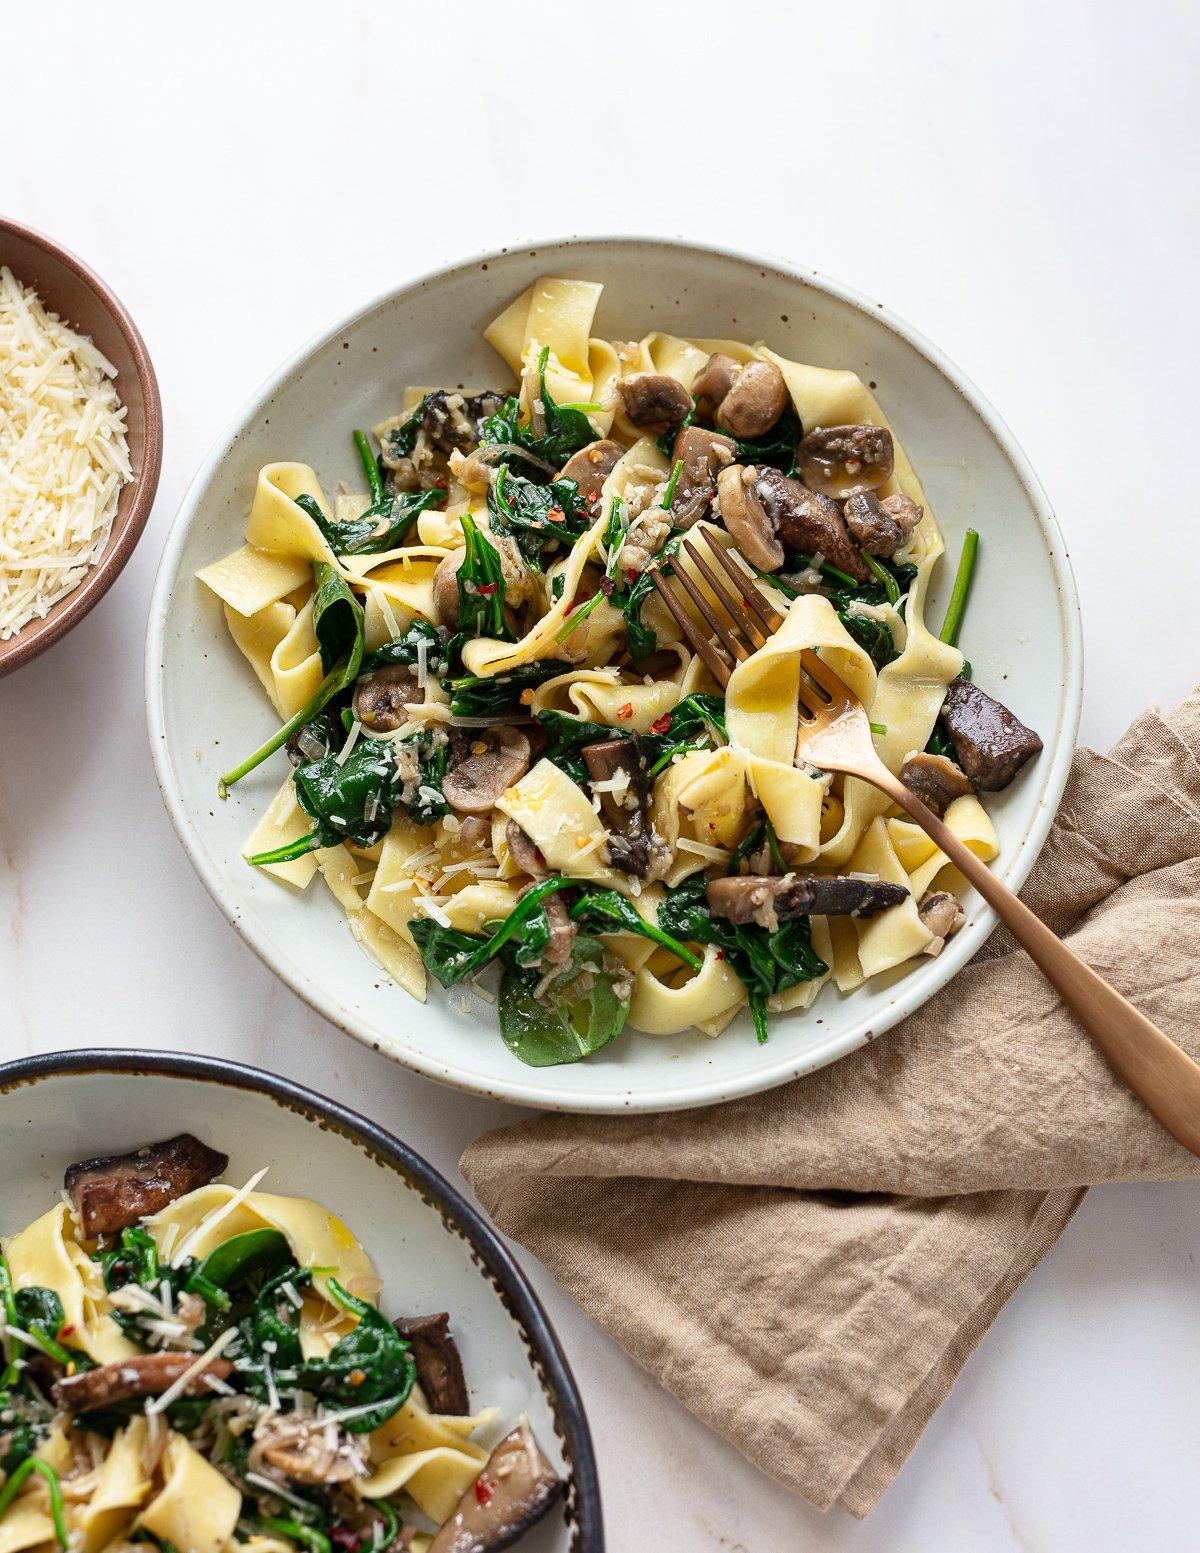 Mushroom Spinach Pasta with Shallots